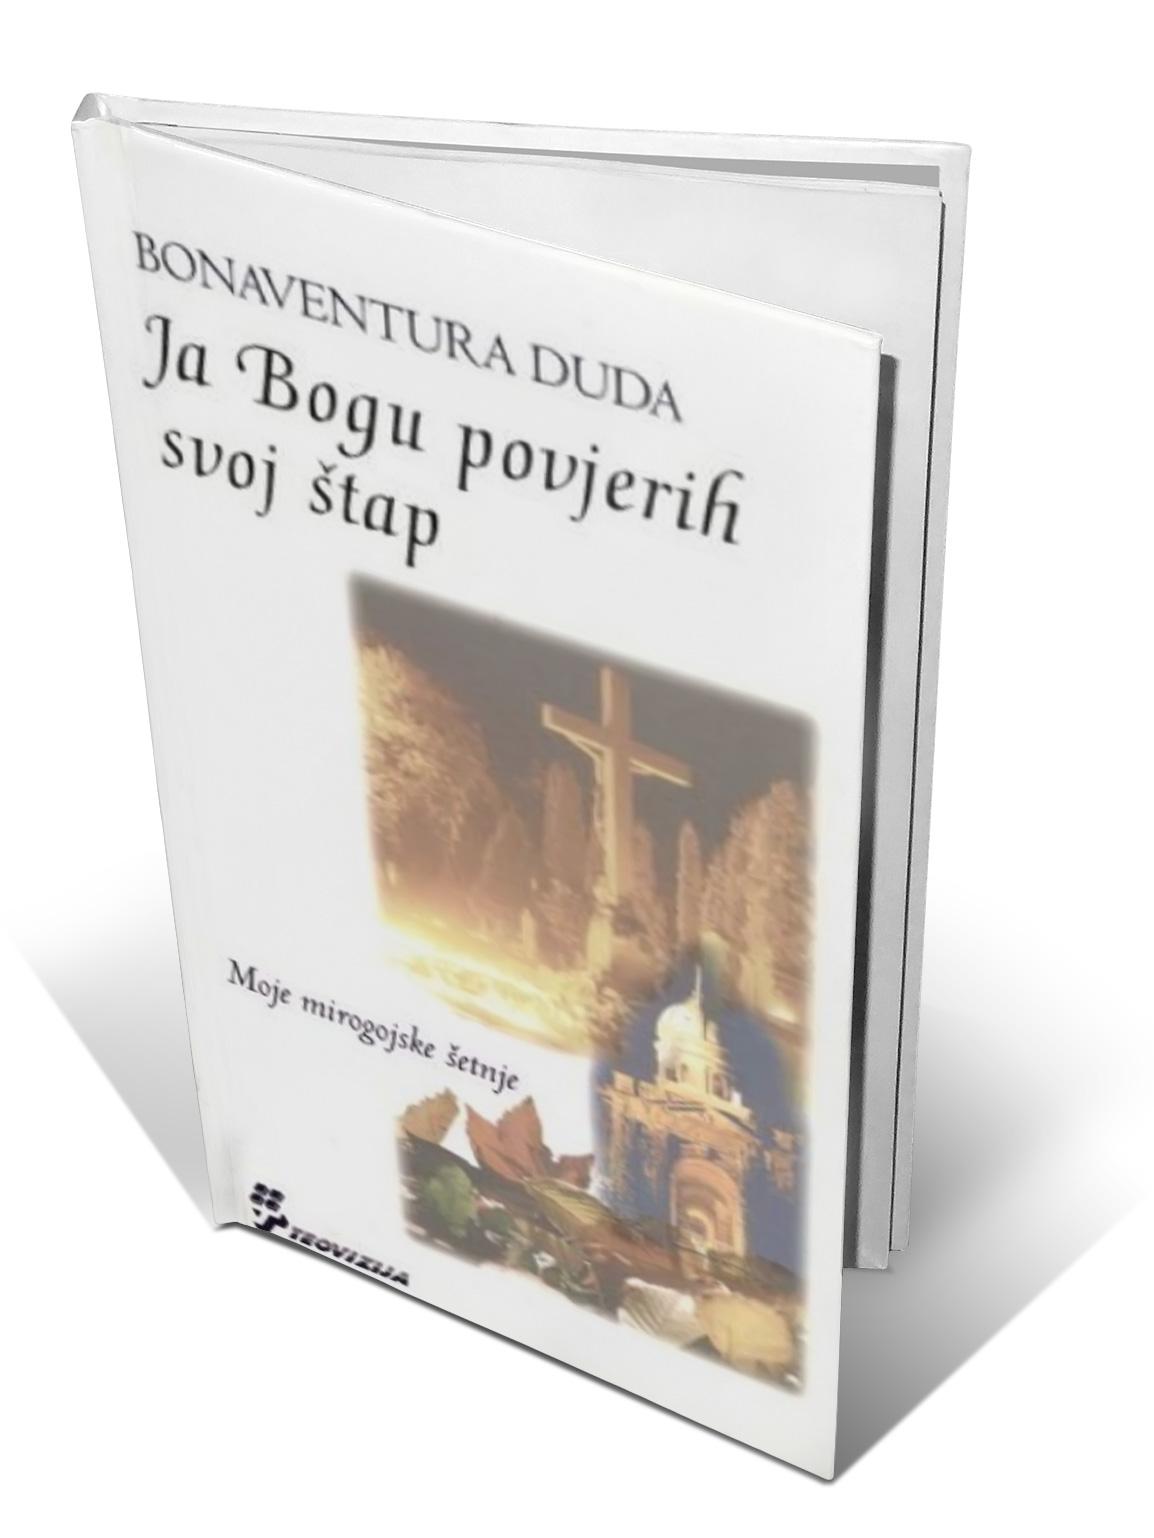 JA BOGU POVJERIH SVOJ ŠTAP - fra Bonaventura Duda